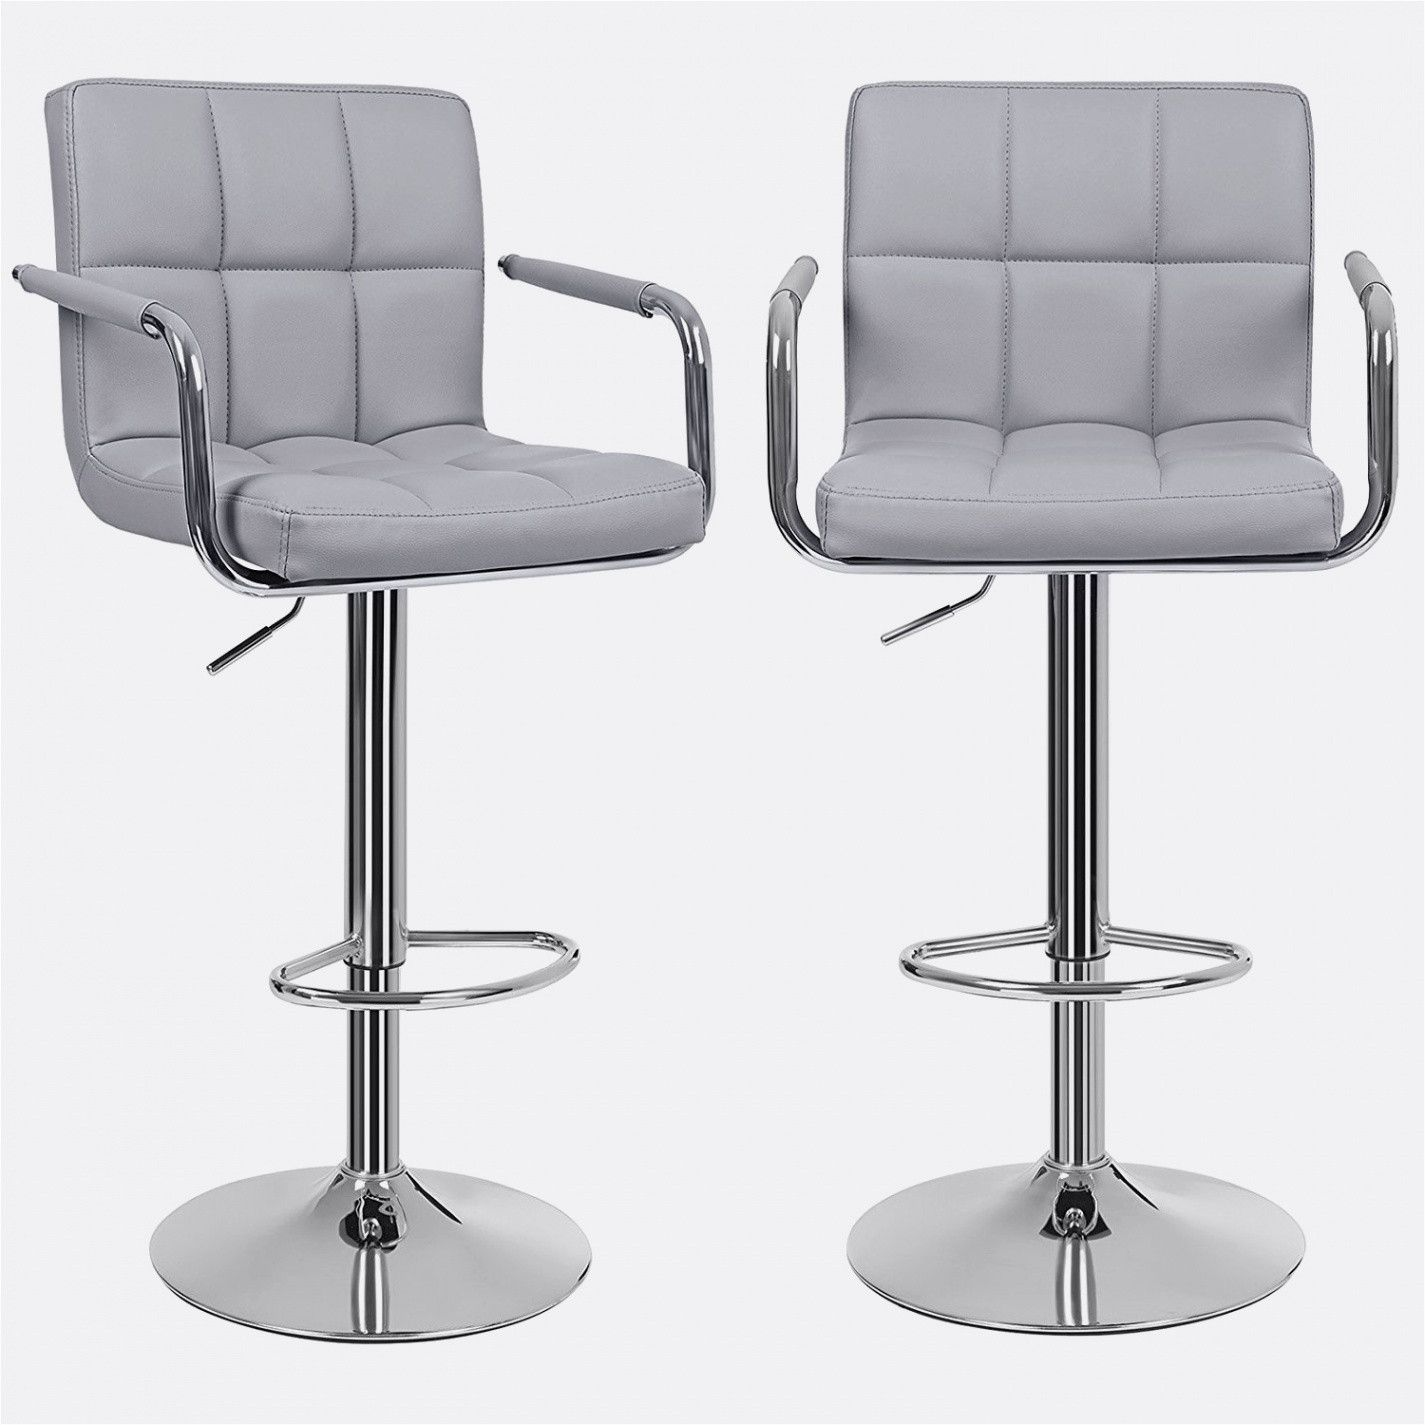 Fresh Tabouret Marchepied Castorama Stool Chair Bar Stools